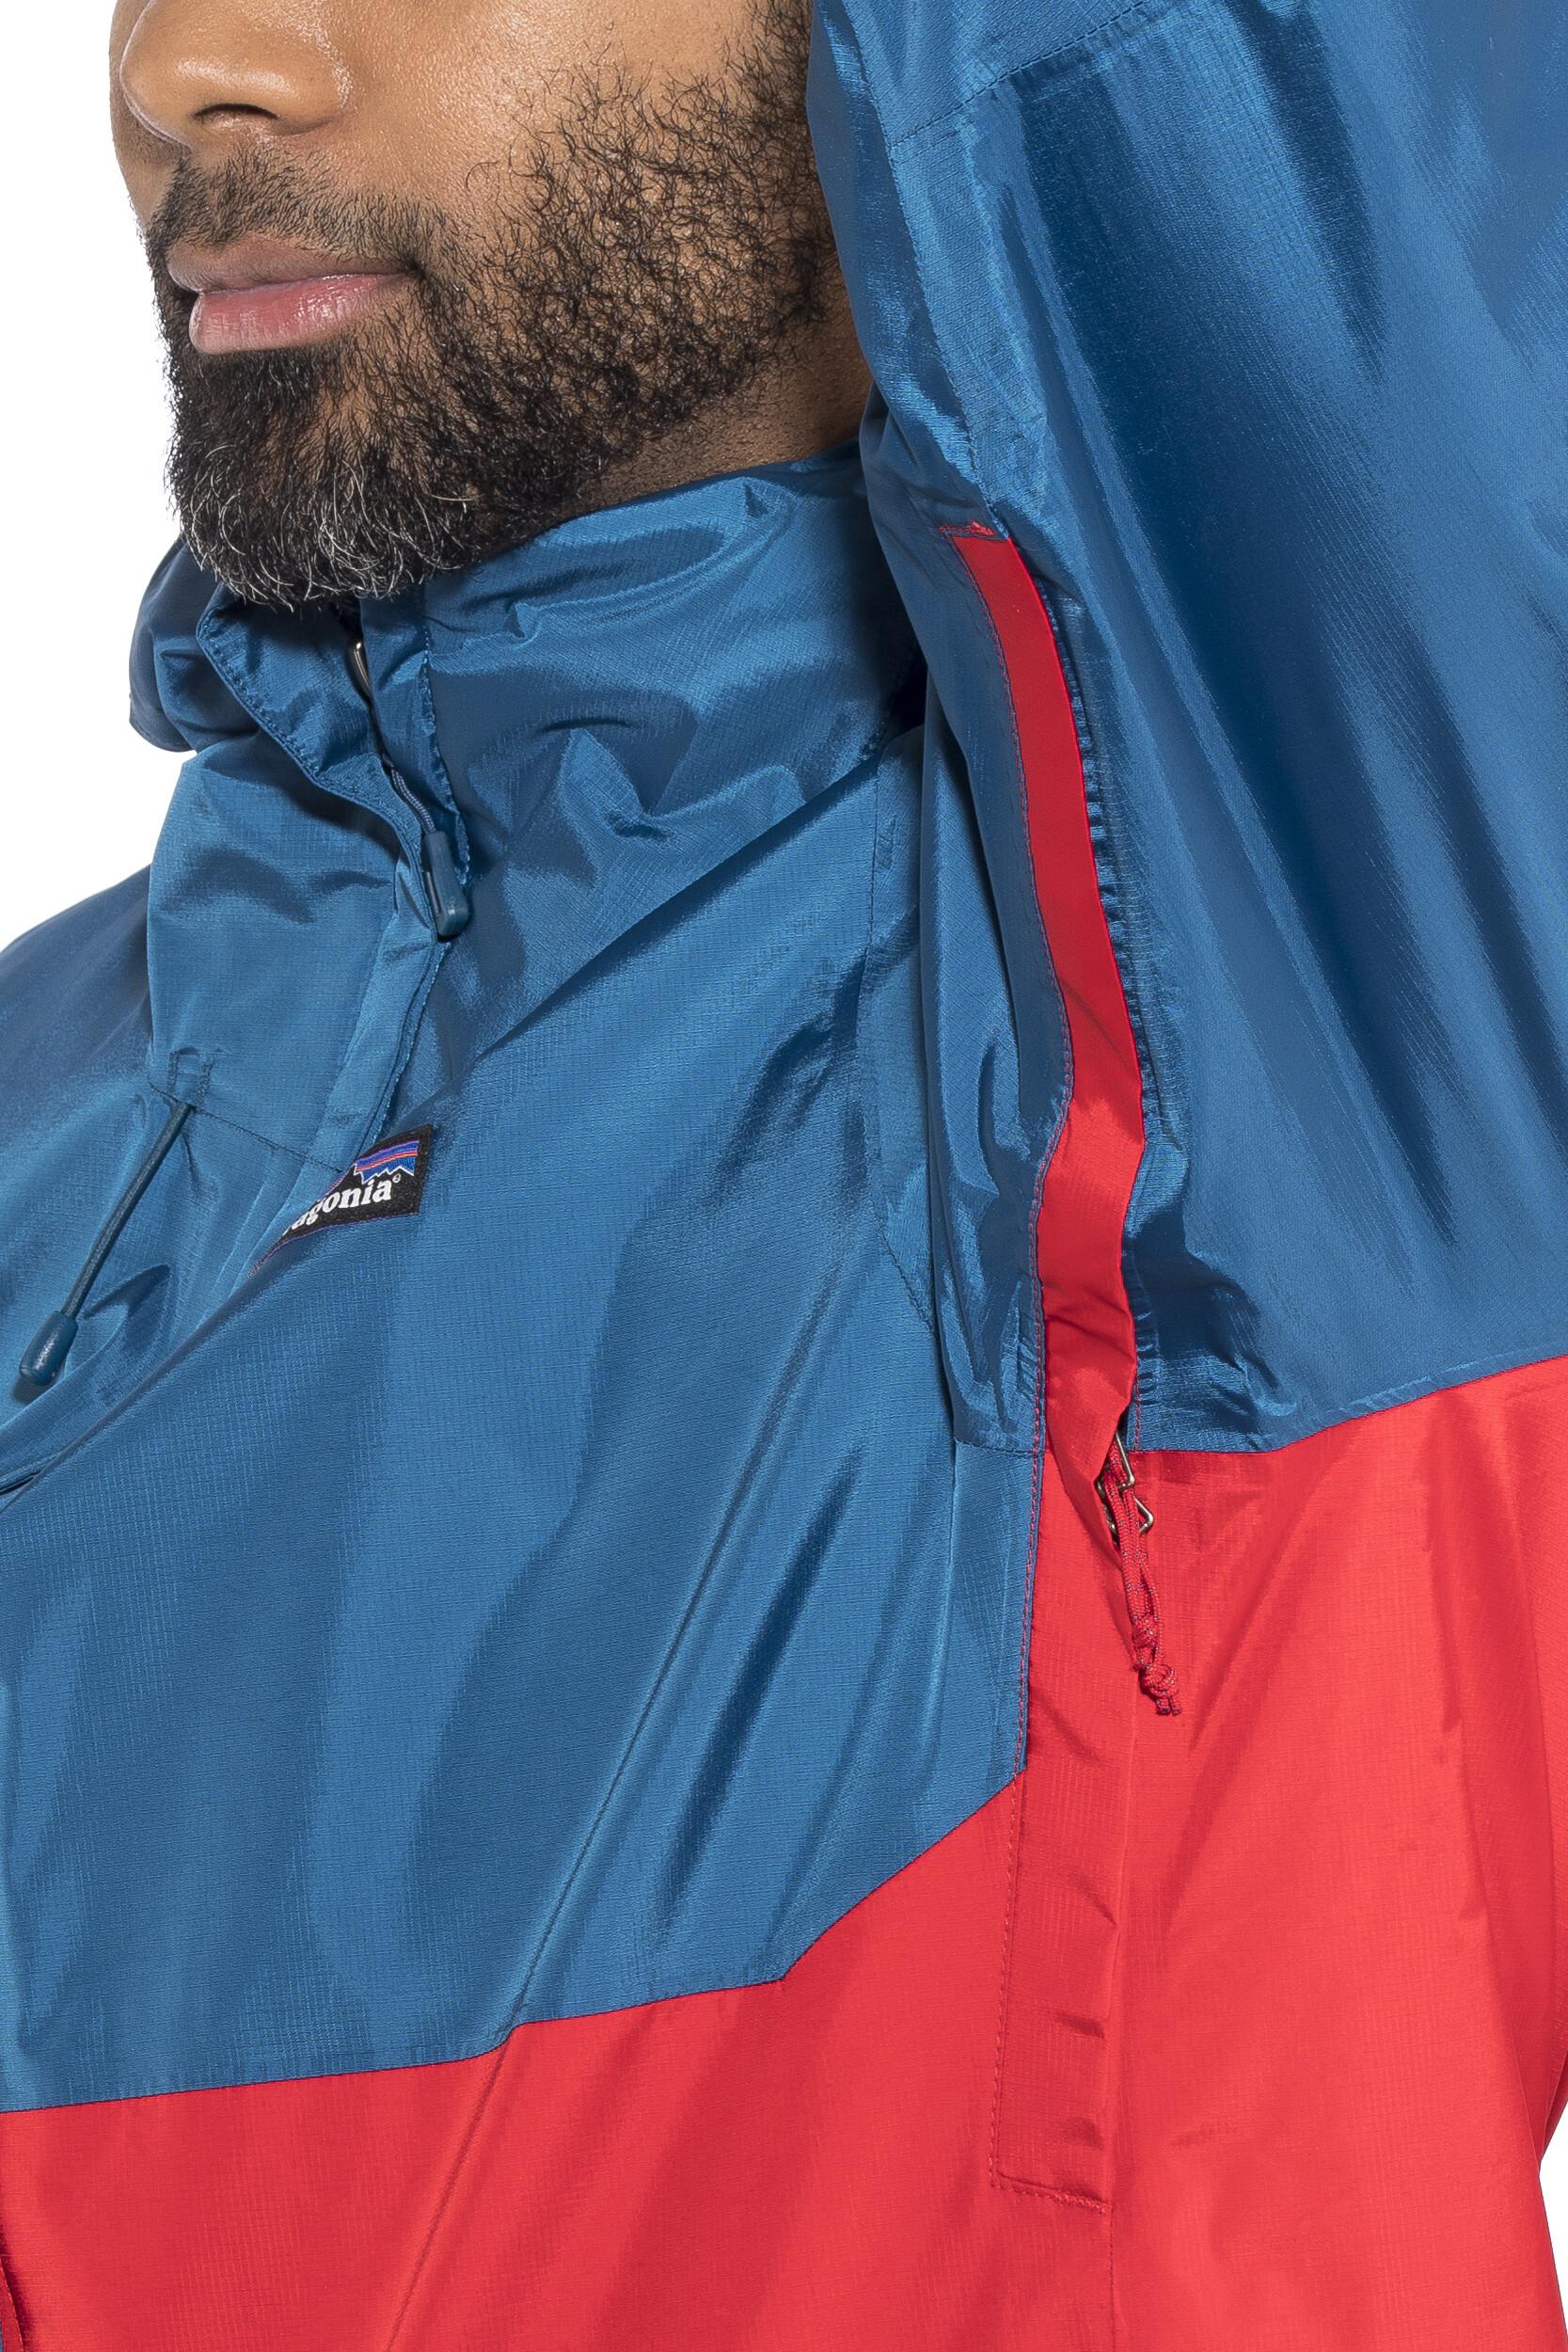 3b7f720d Patagonia Torrentshell Jacket Herren big sur blue w/fire red | campz.at